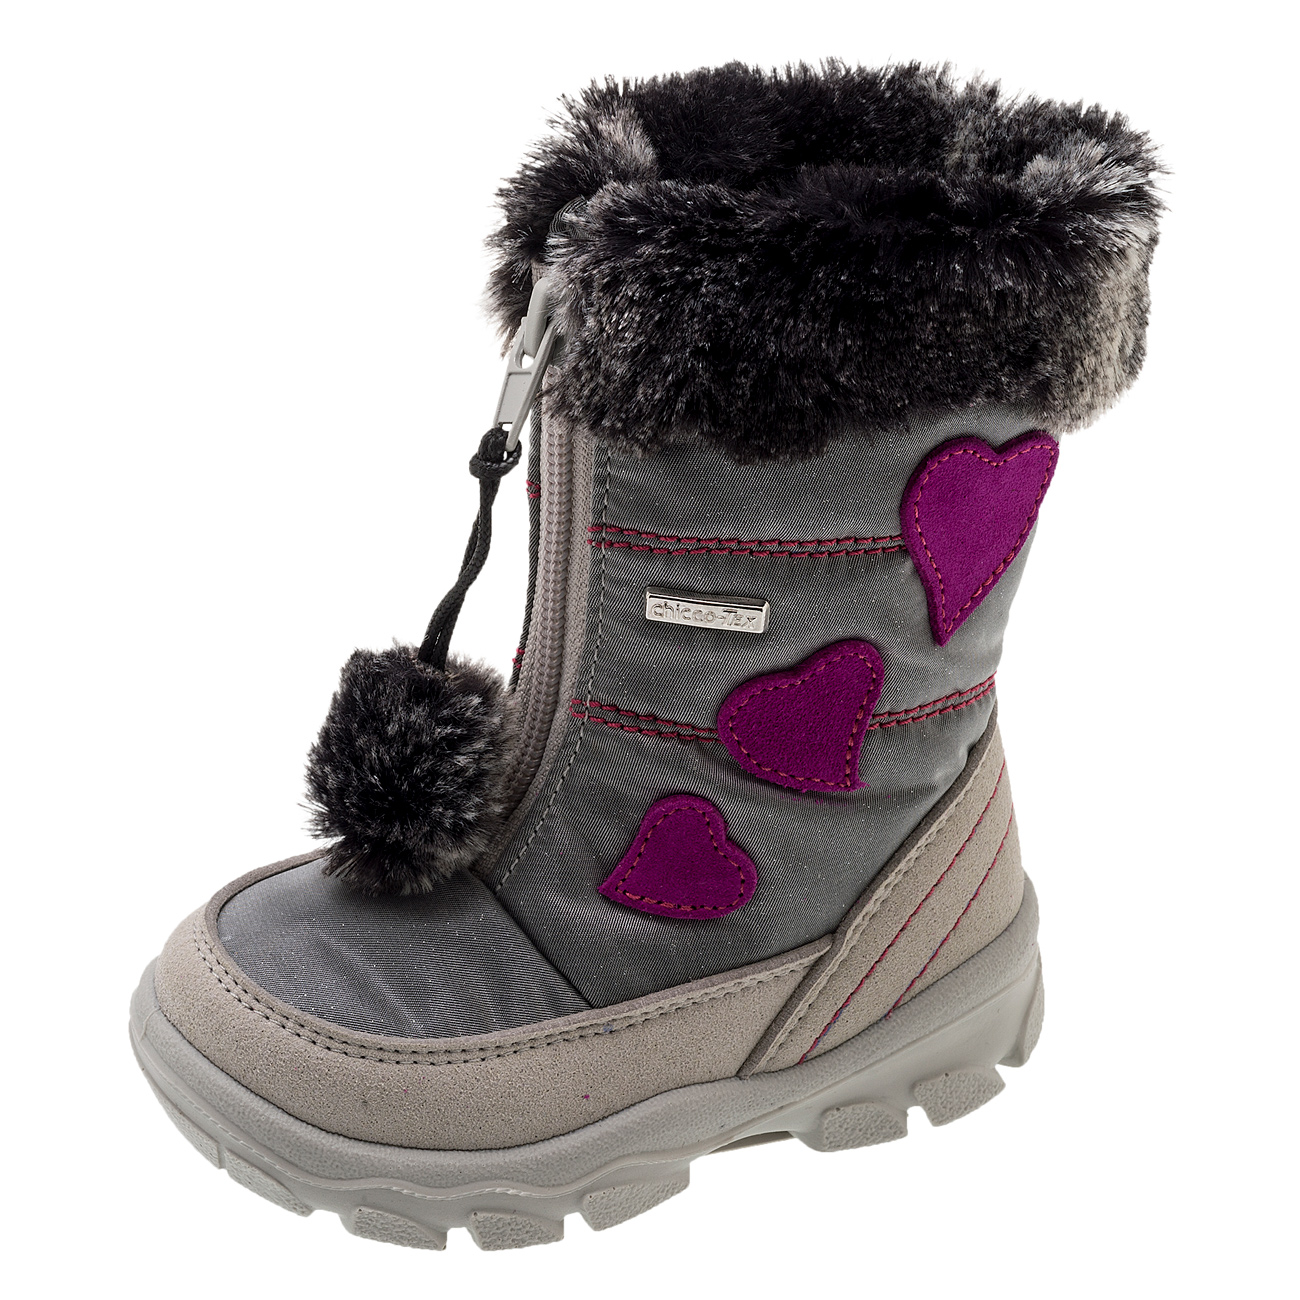 Pantof Copii Chicco, Gri imagine